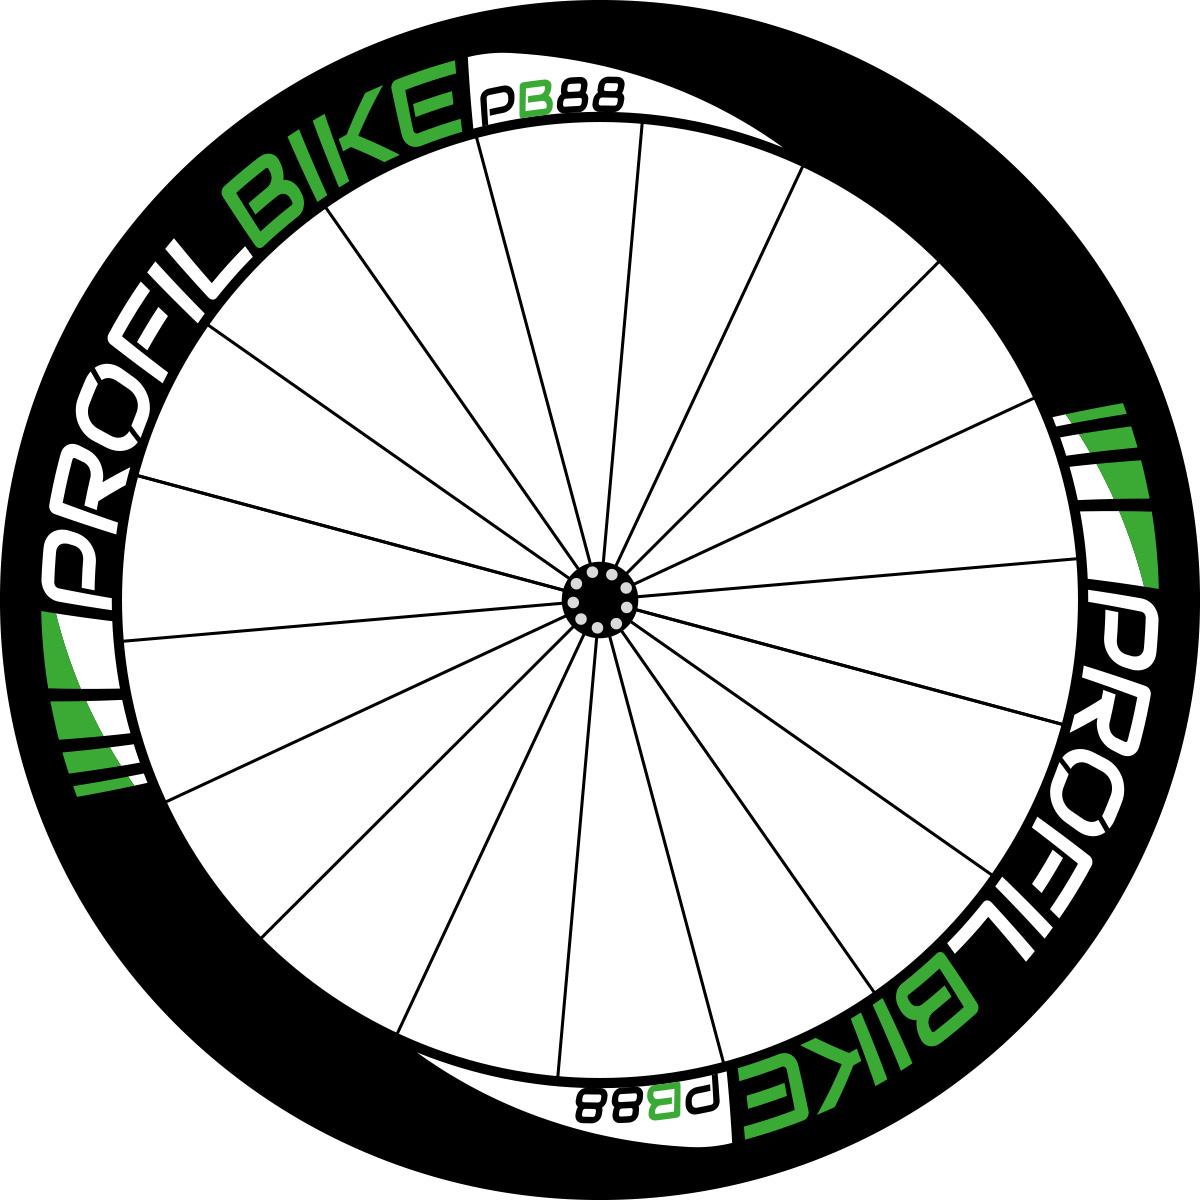 Profilbike PB88 CARBON design vert